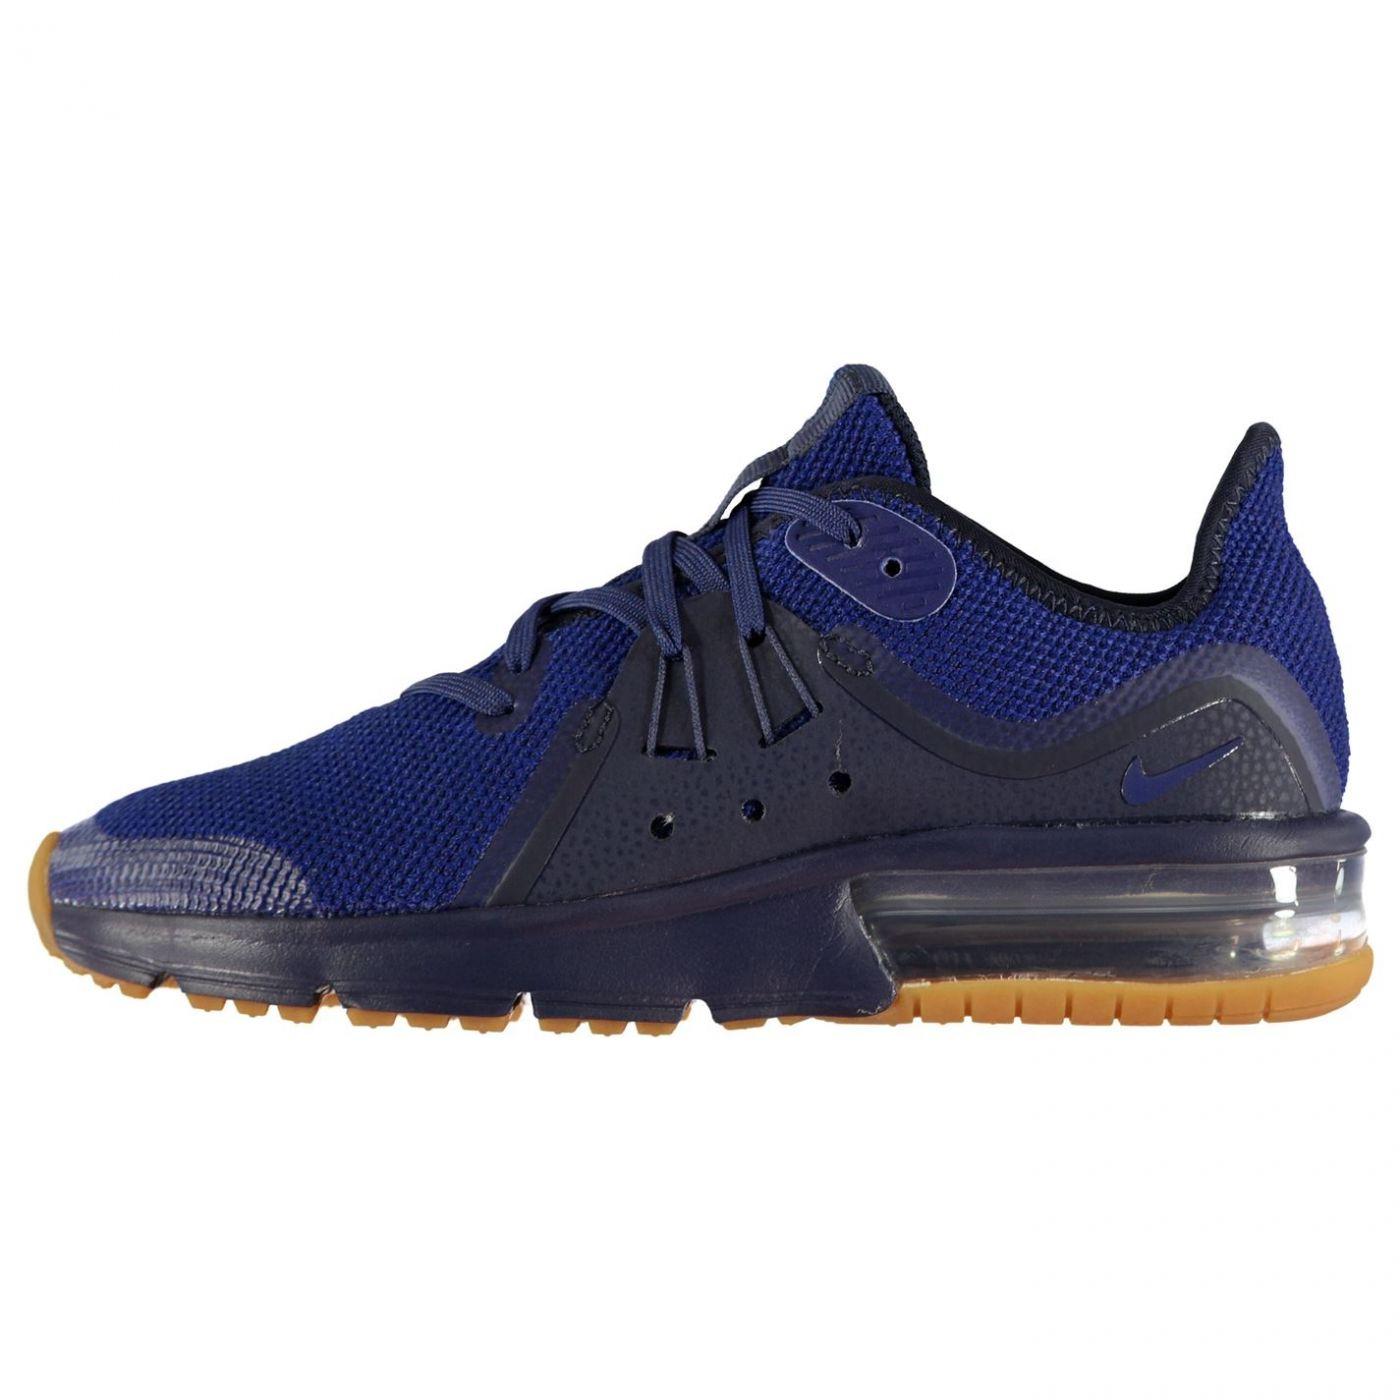 020f6904f3ebb Nike Air Max Sequent 4 Junior Boys Trainers - FACTCOOL